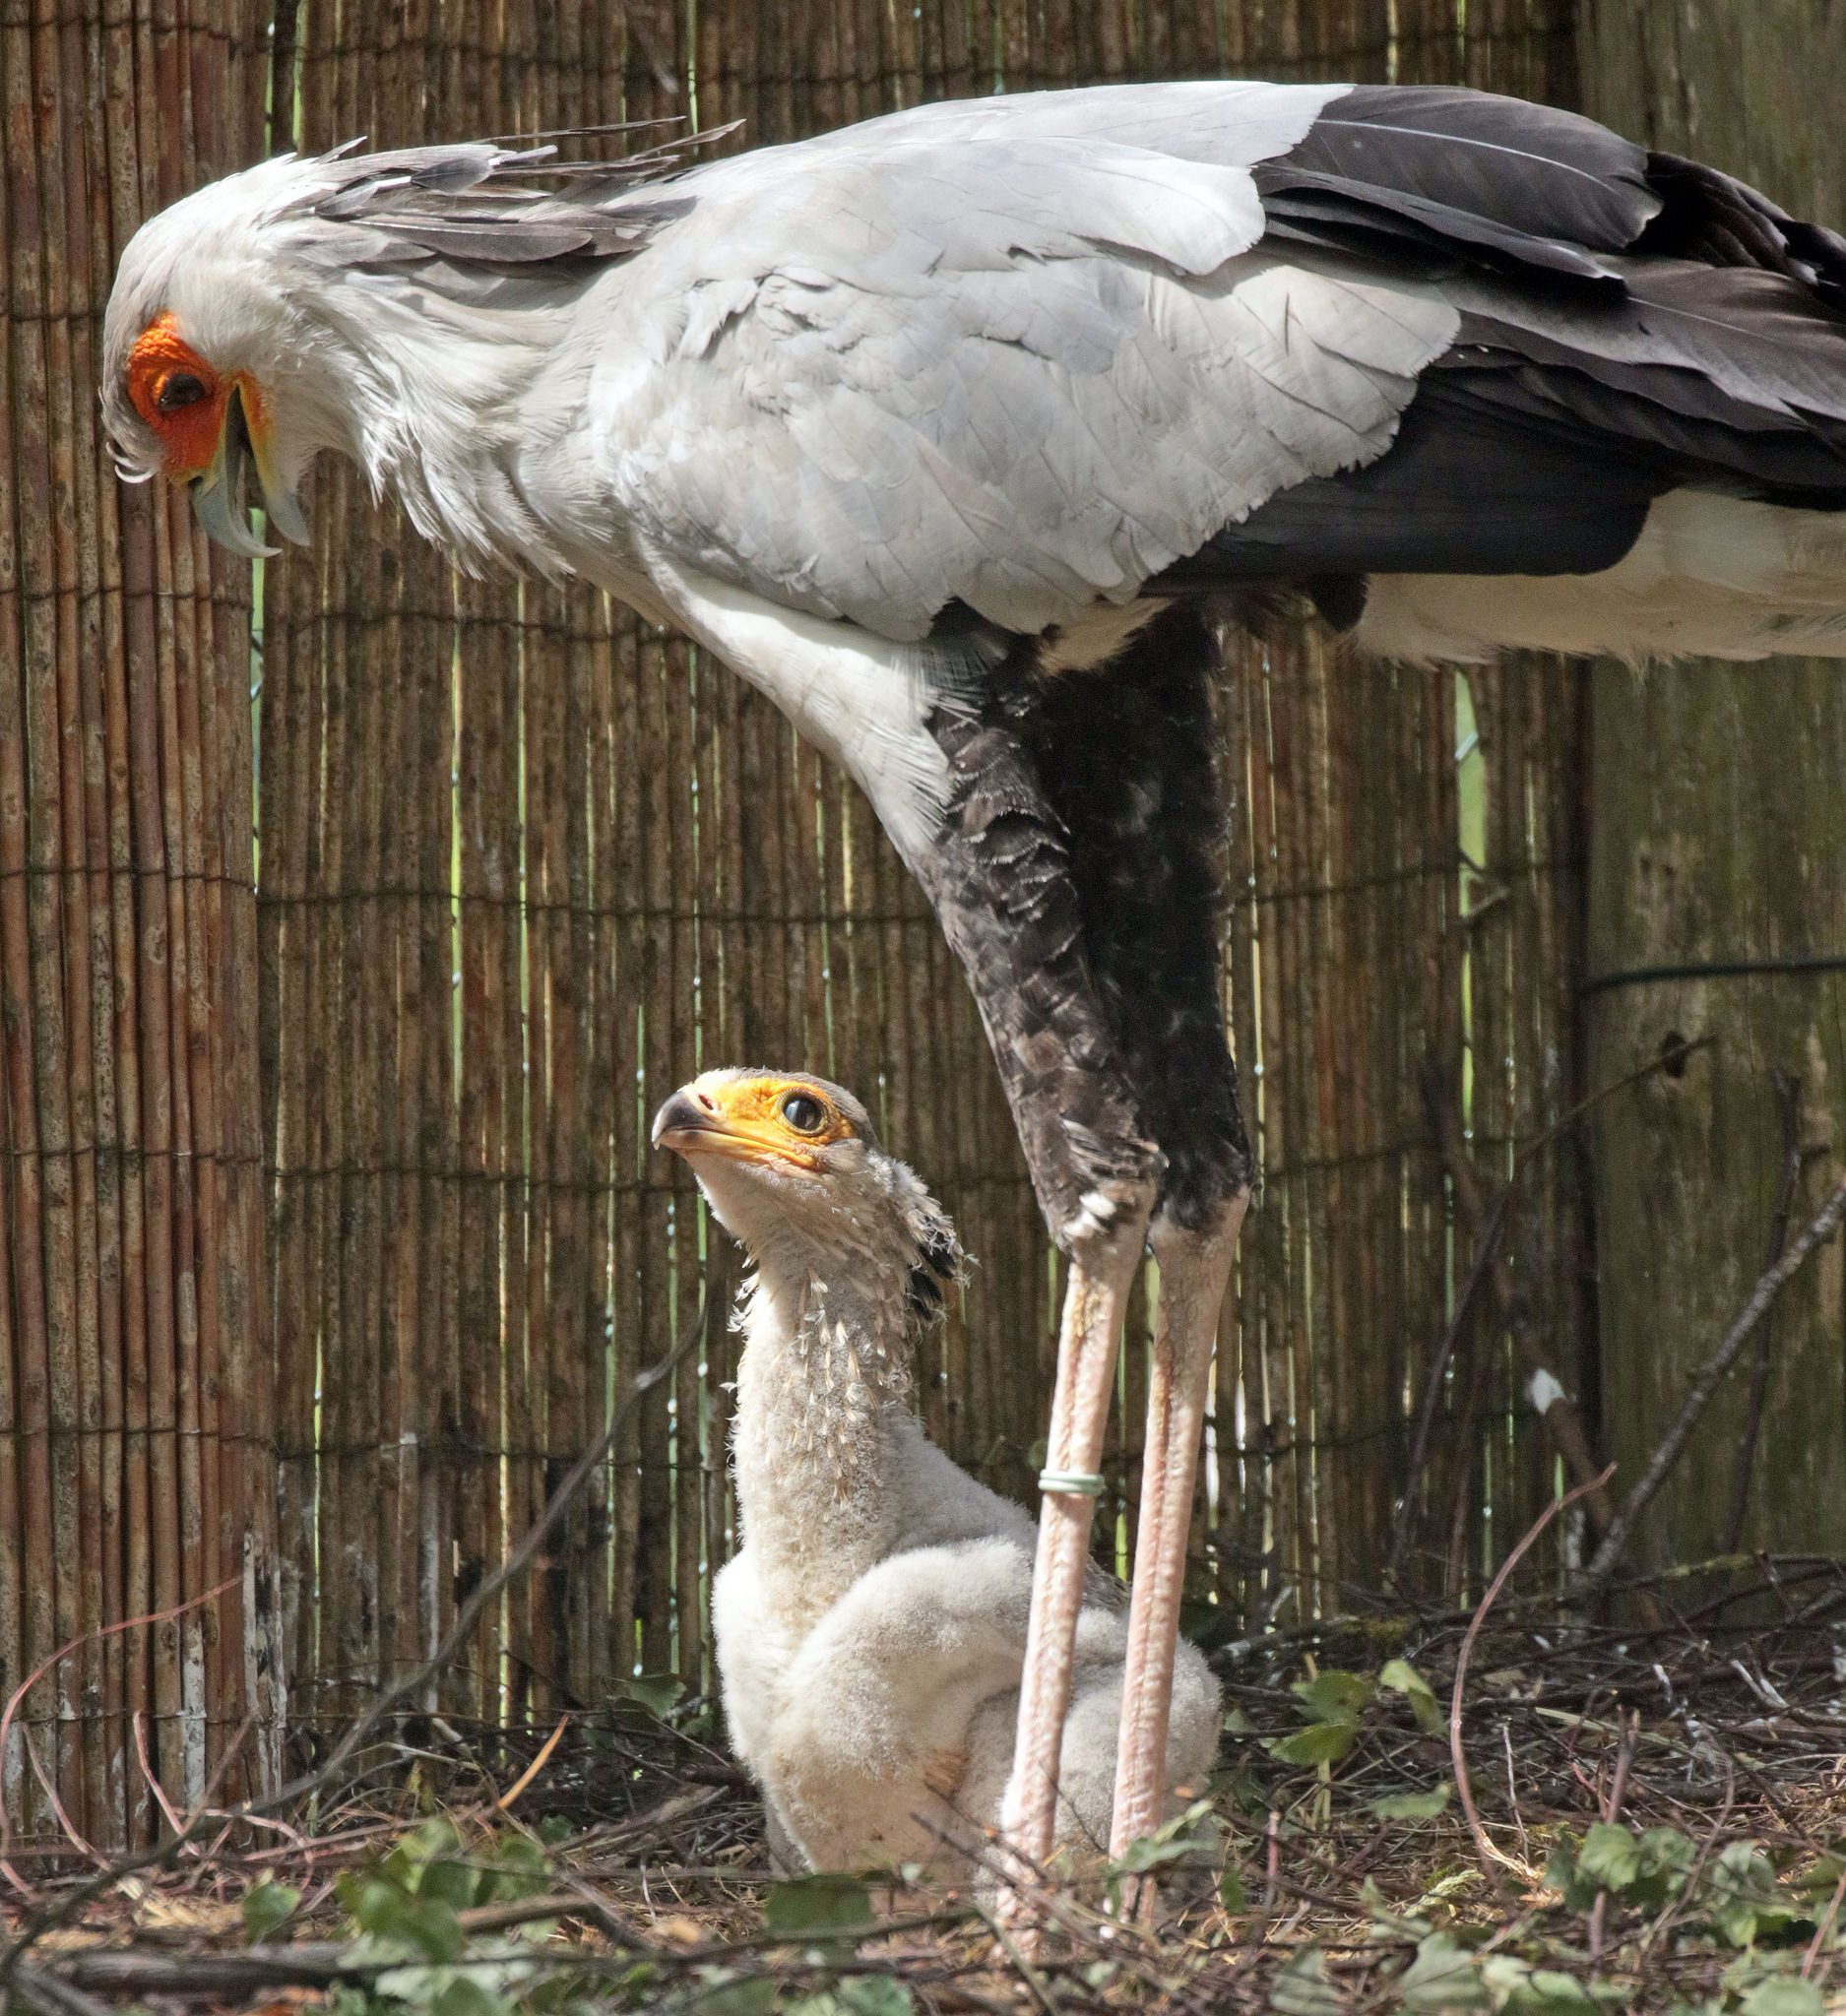 Secretary bird (Sagittarius serpentarius) & chick